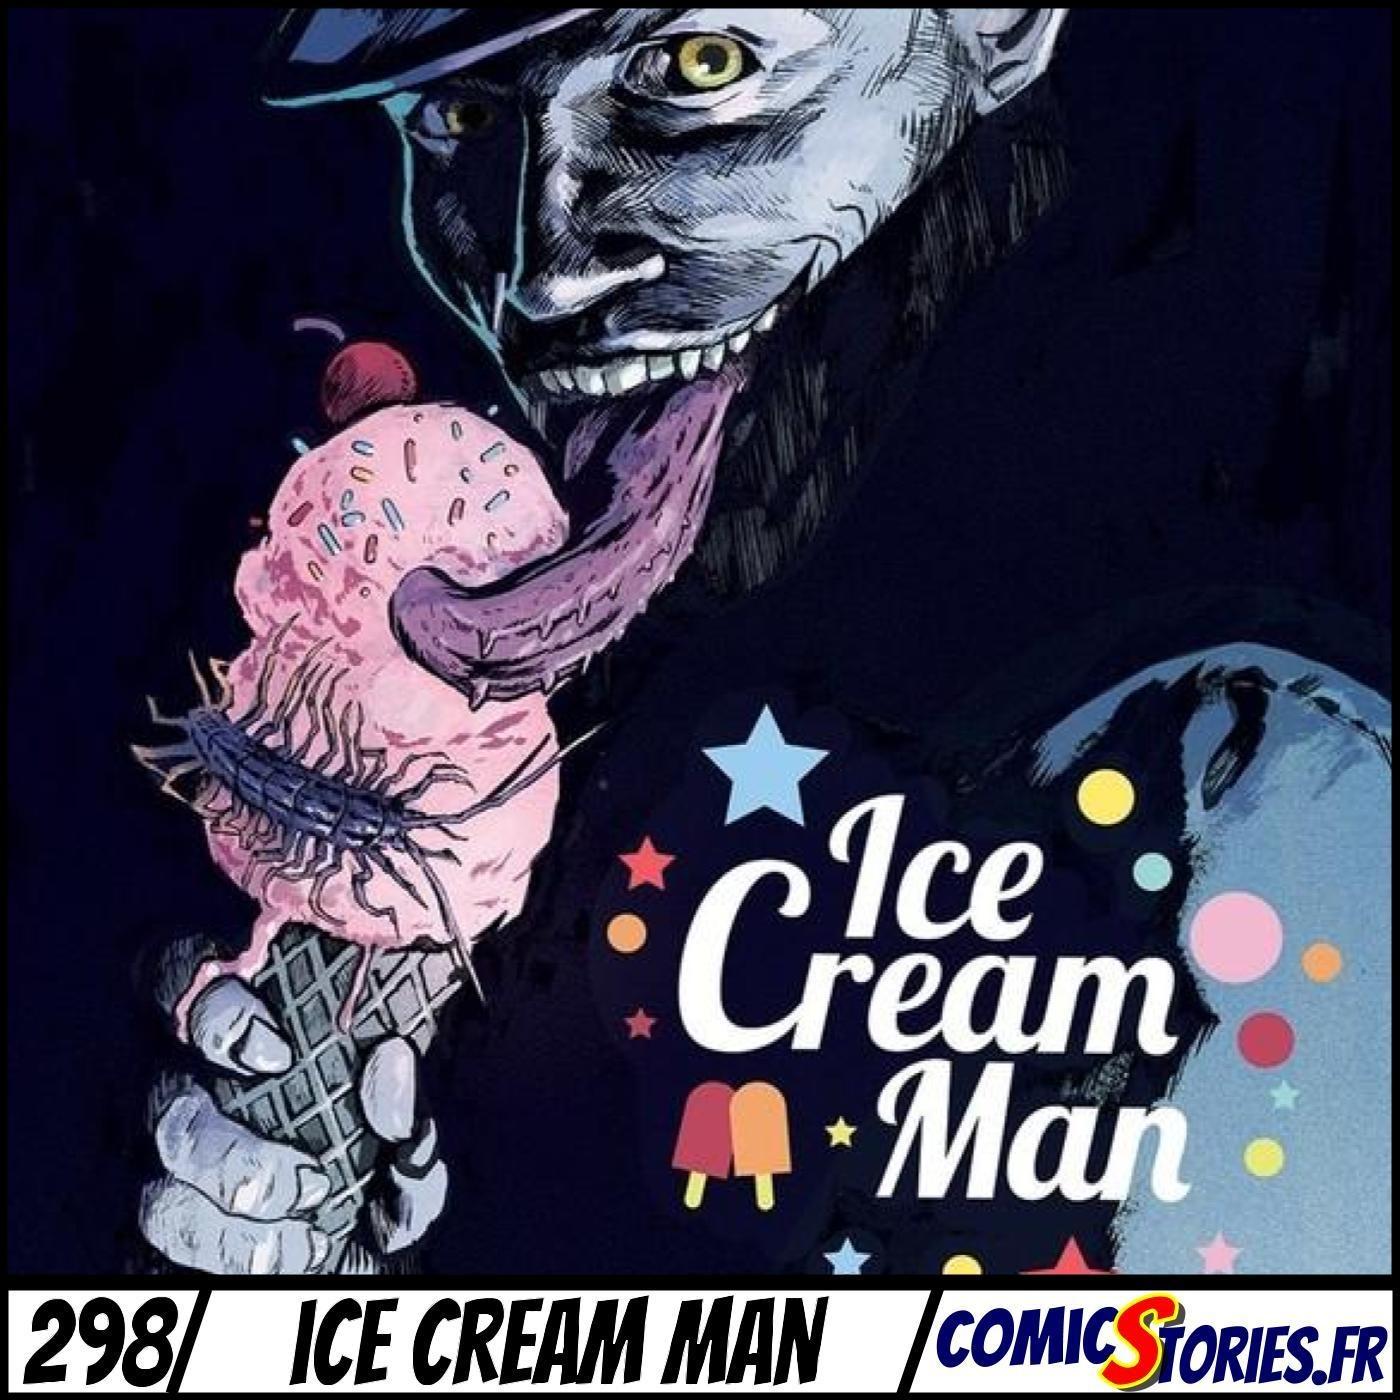 ComicStories #298 -Ice Cream Man